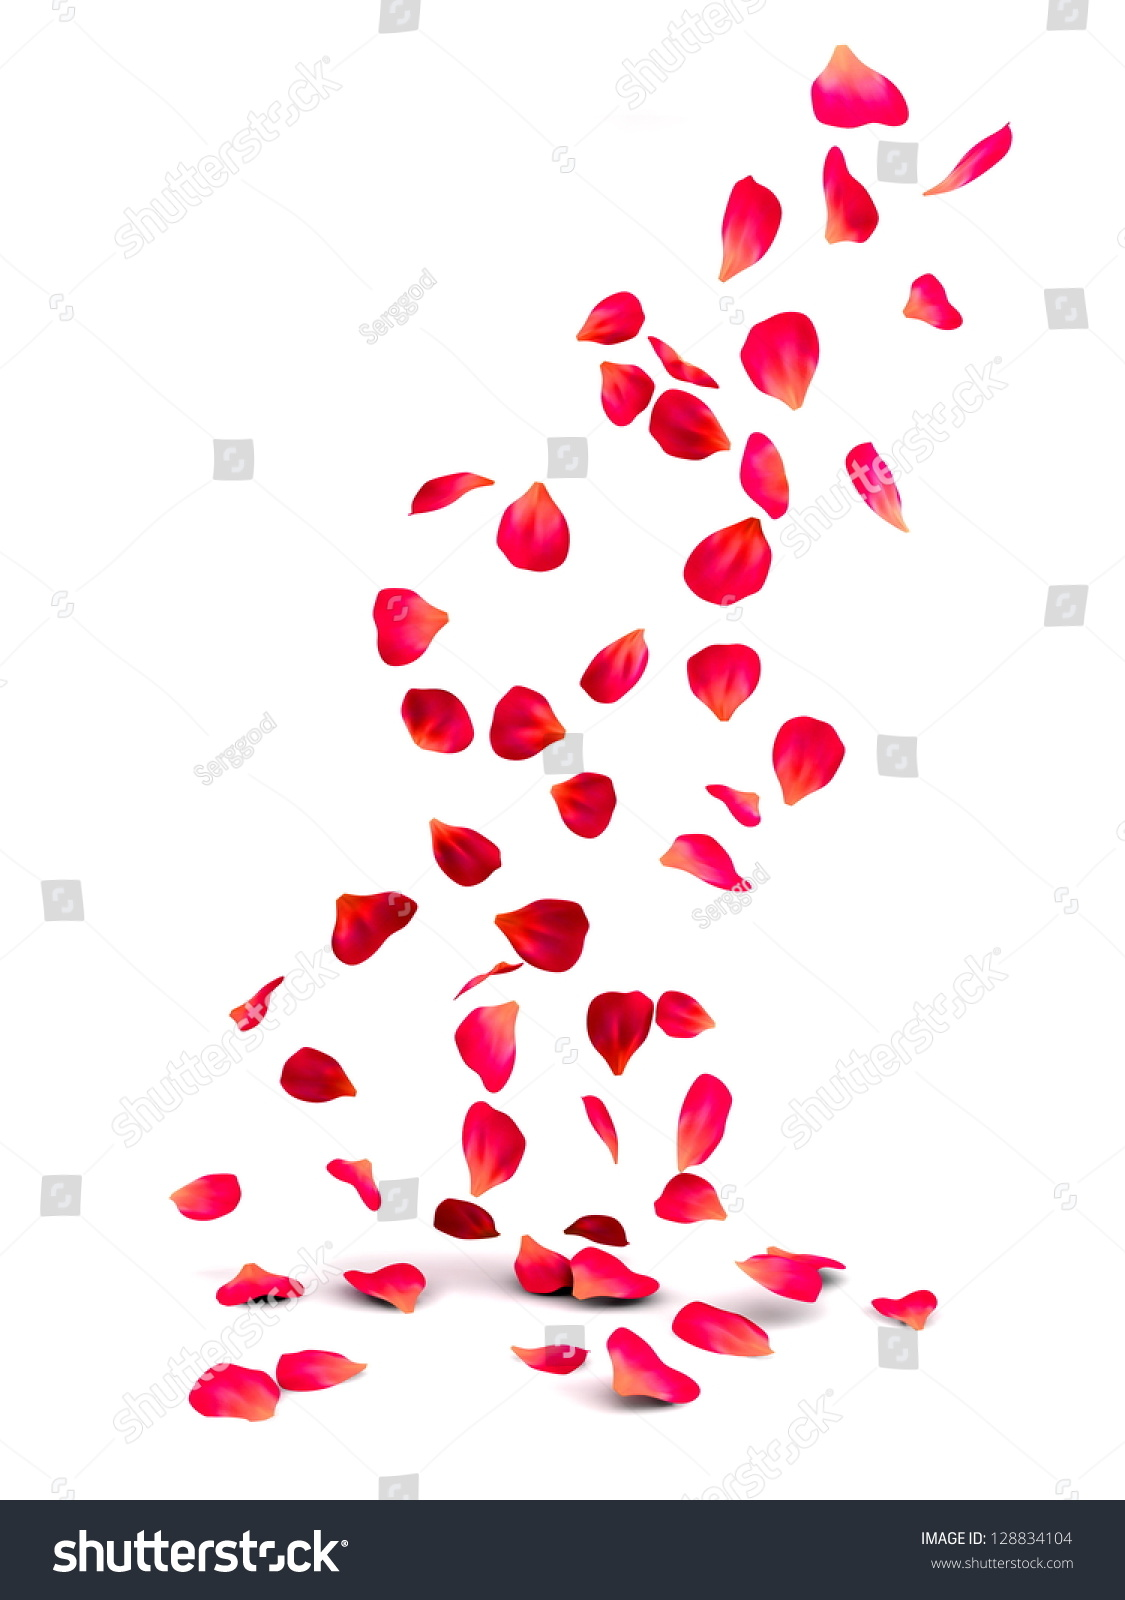 Falling Rose Petals Stock Illustration 128834104 ... Petals Falling From A Flower